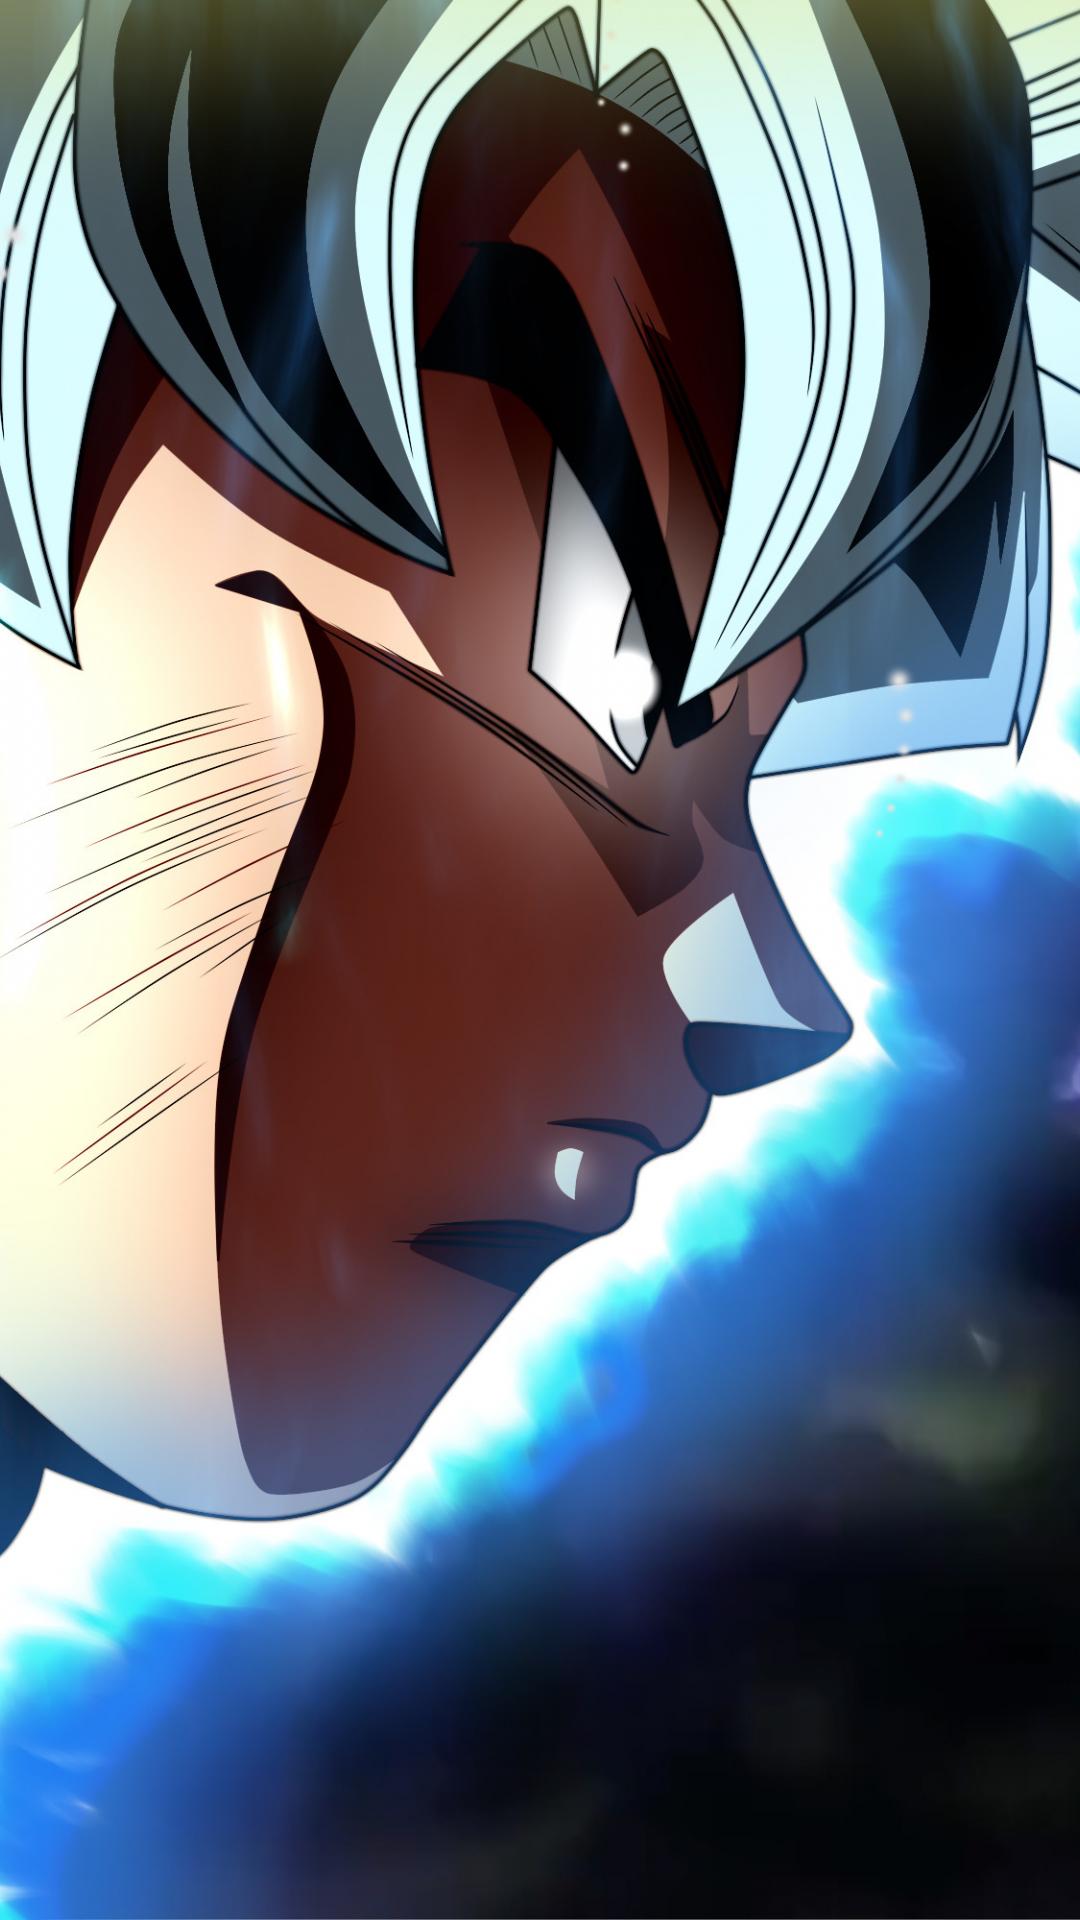 Download 1080x1920 Wallpaper Goku S Face Dragon Ball Super 4k